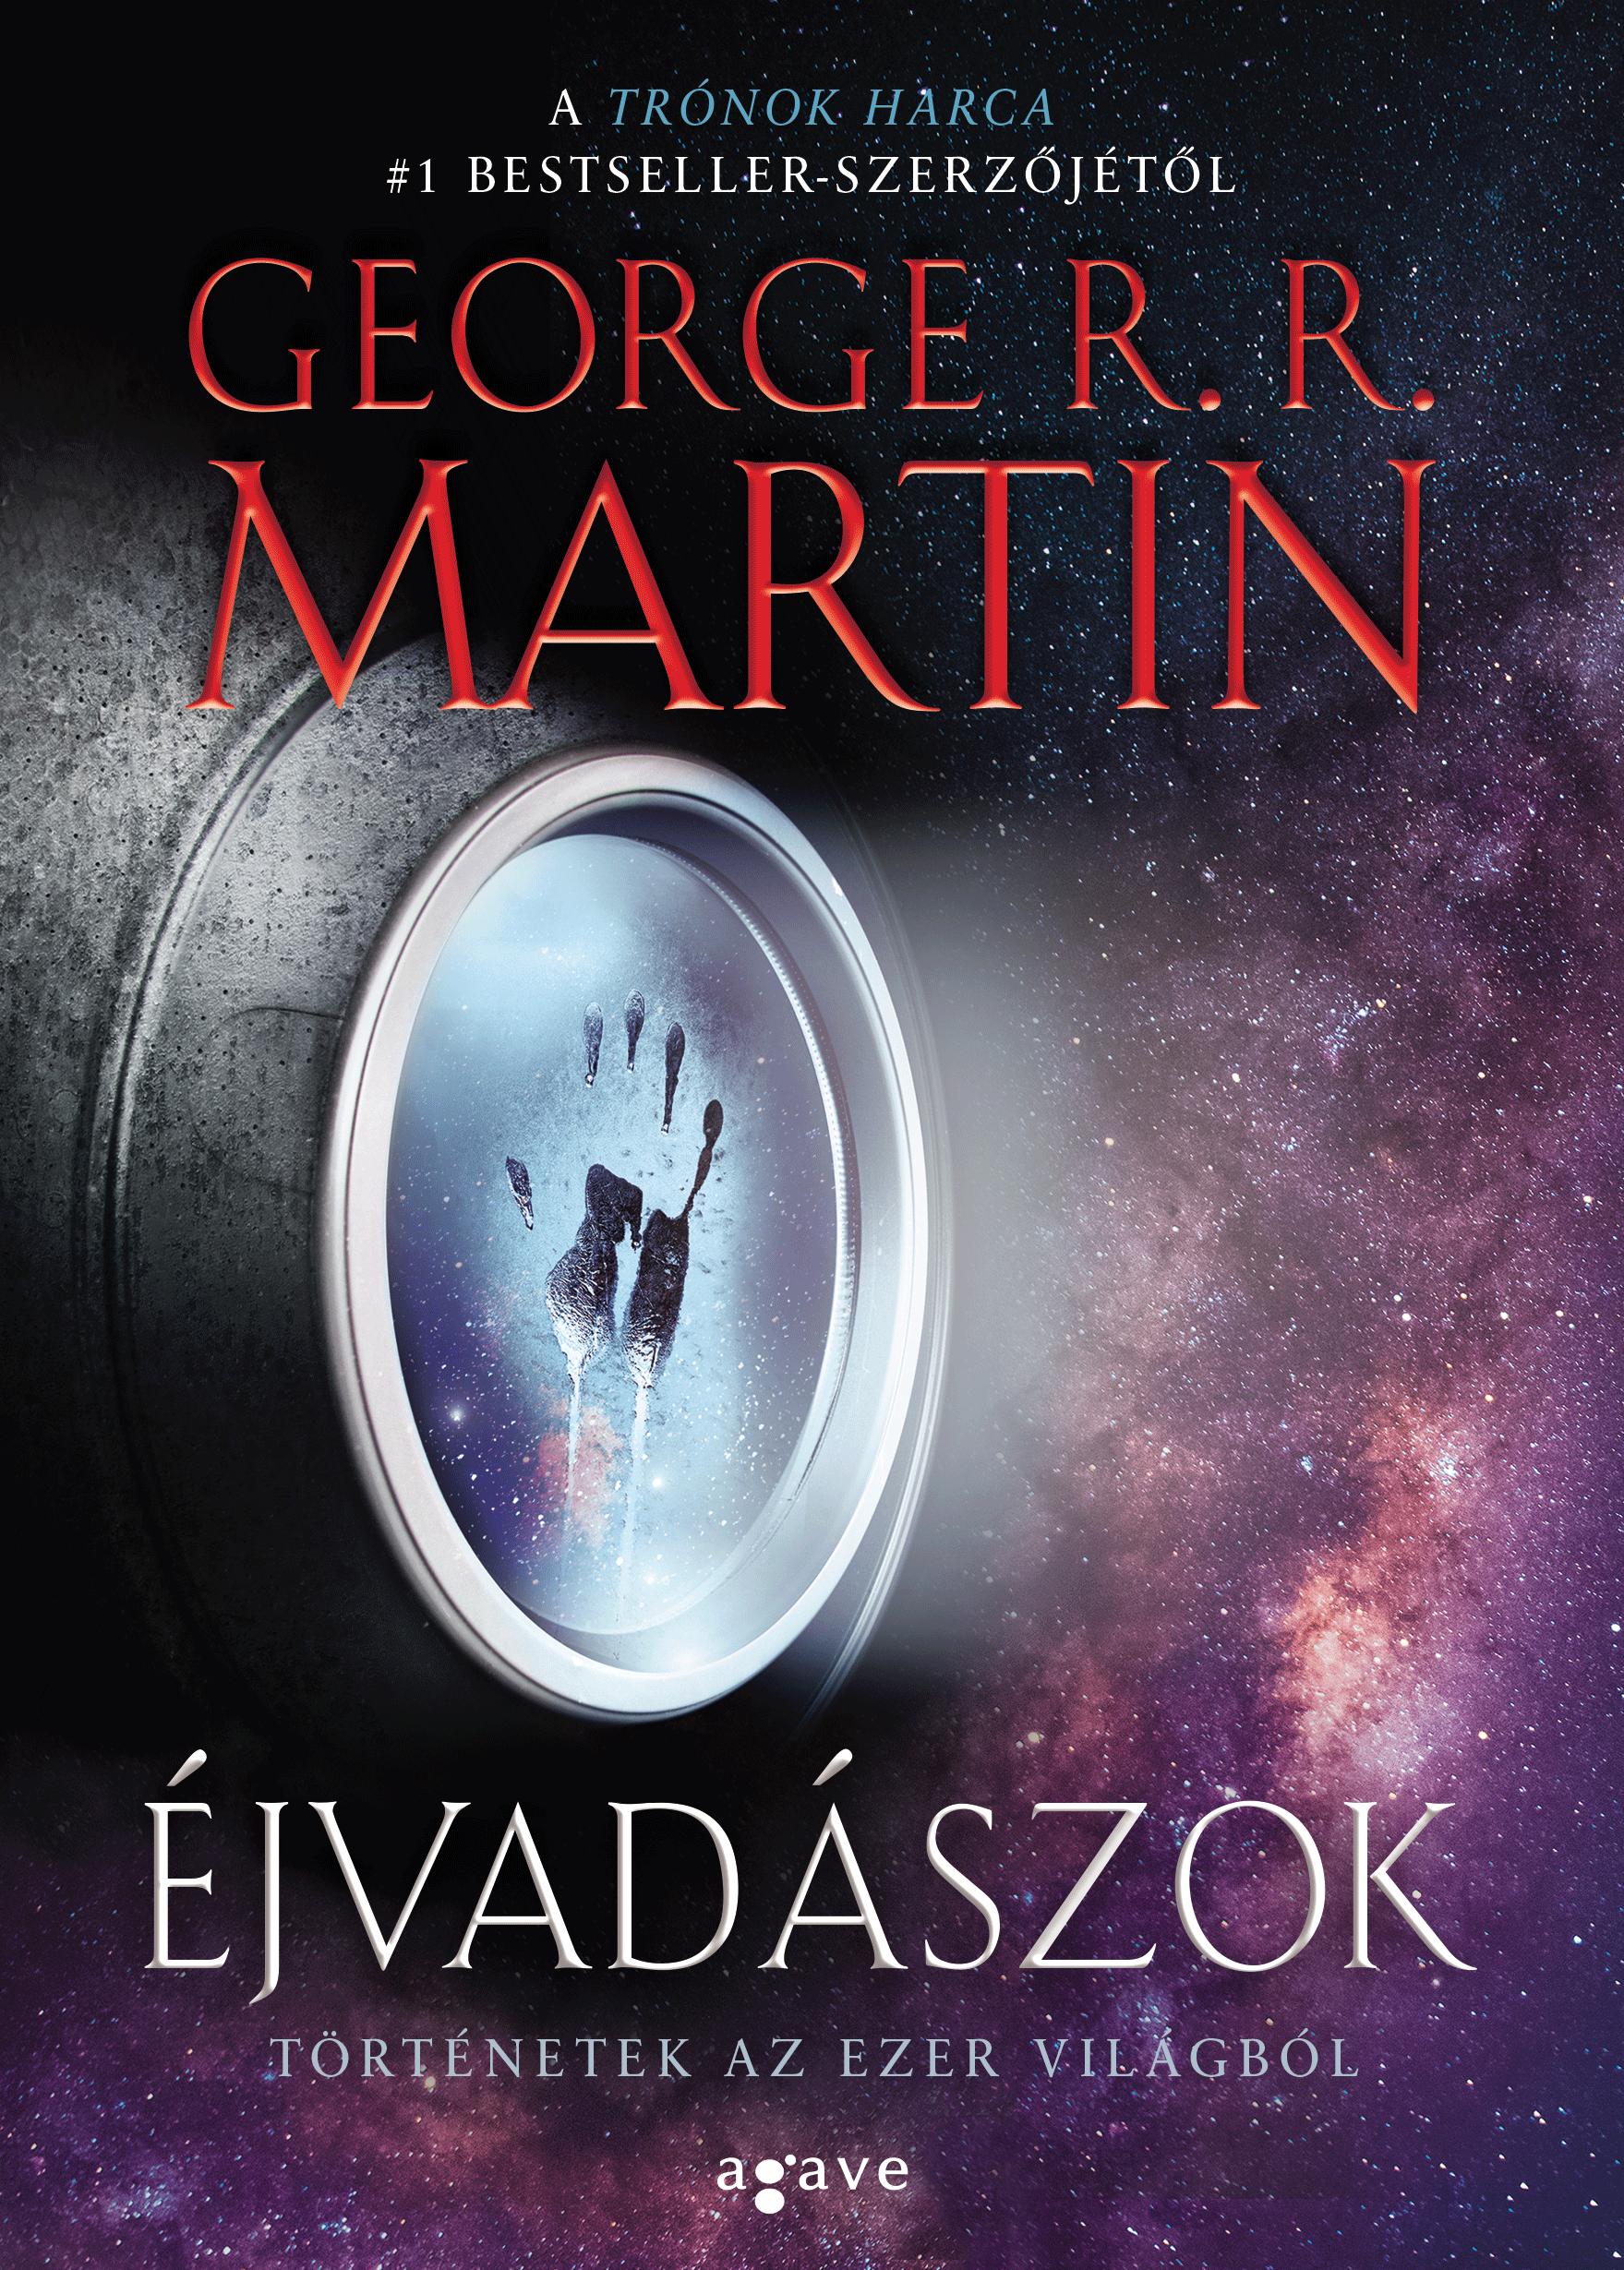 george_rr_martin_ejvadaszok_b1_002.png